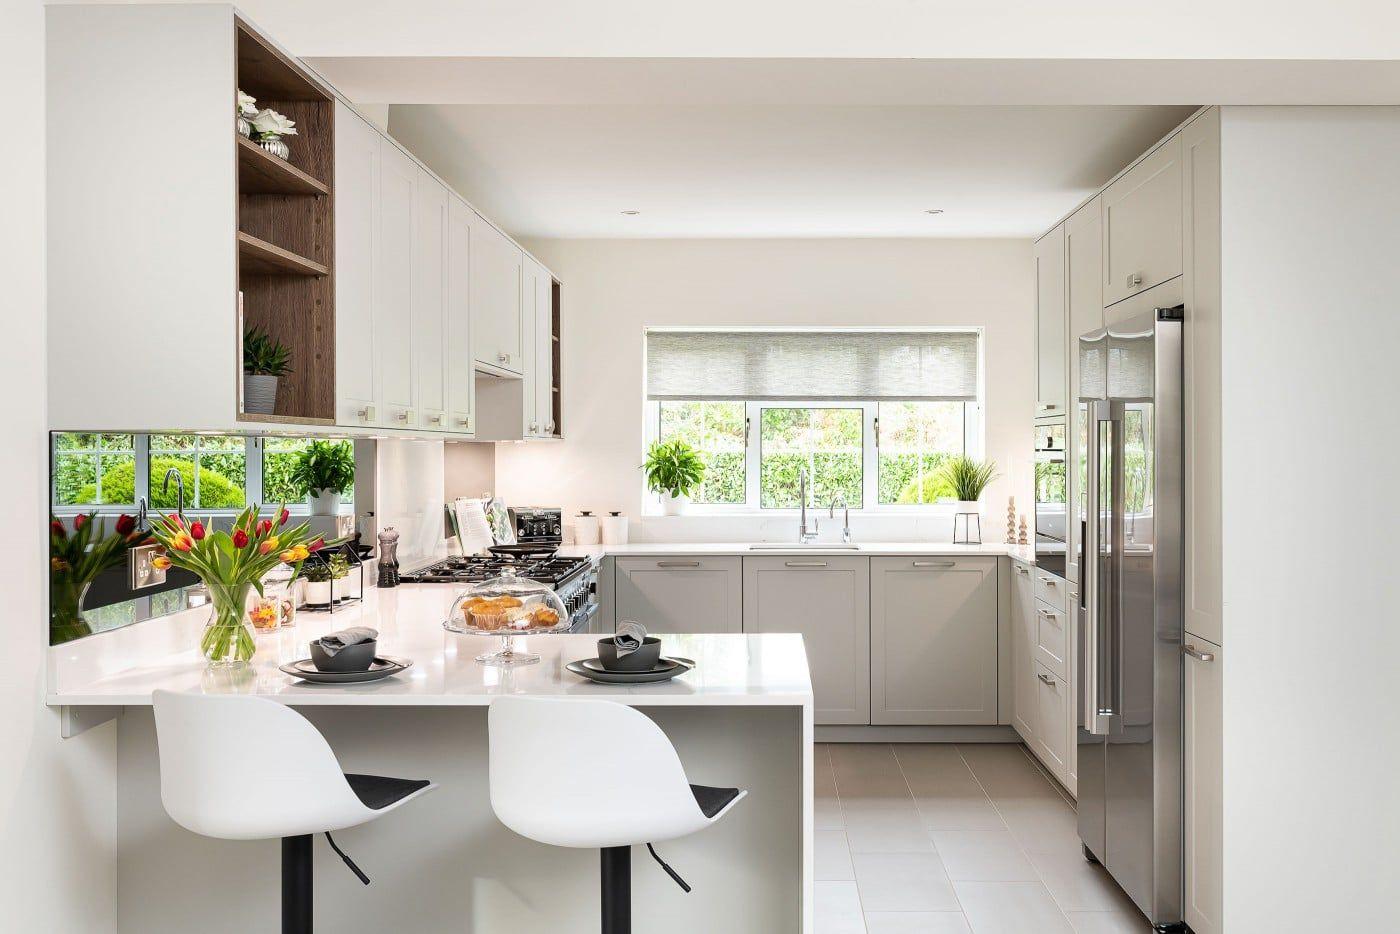 Ushape kitchen with a peninsula Shaker style